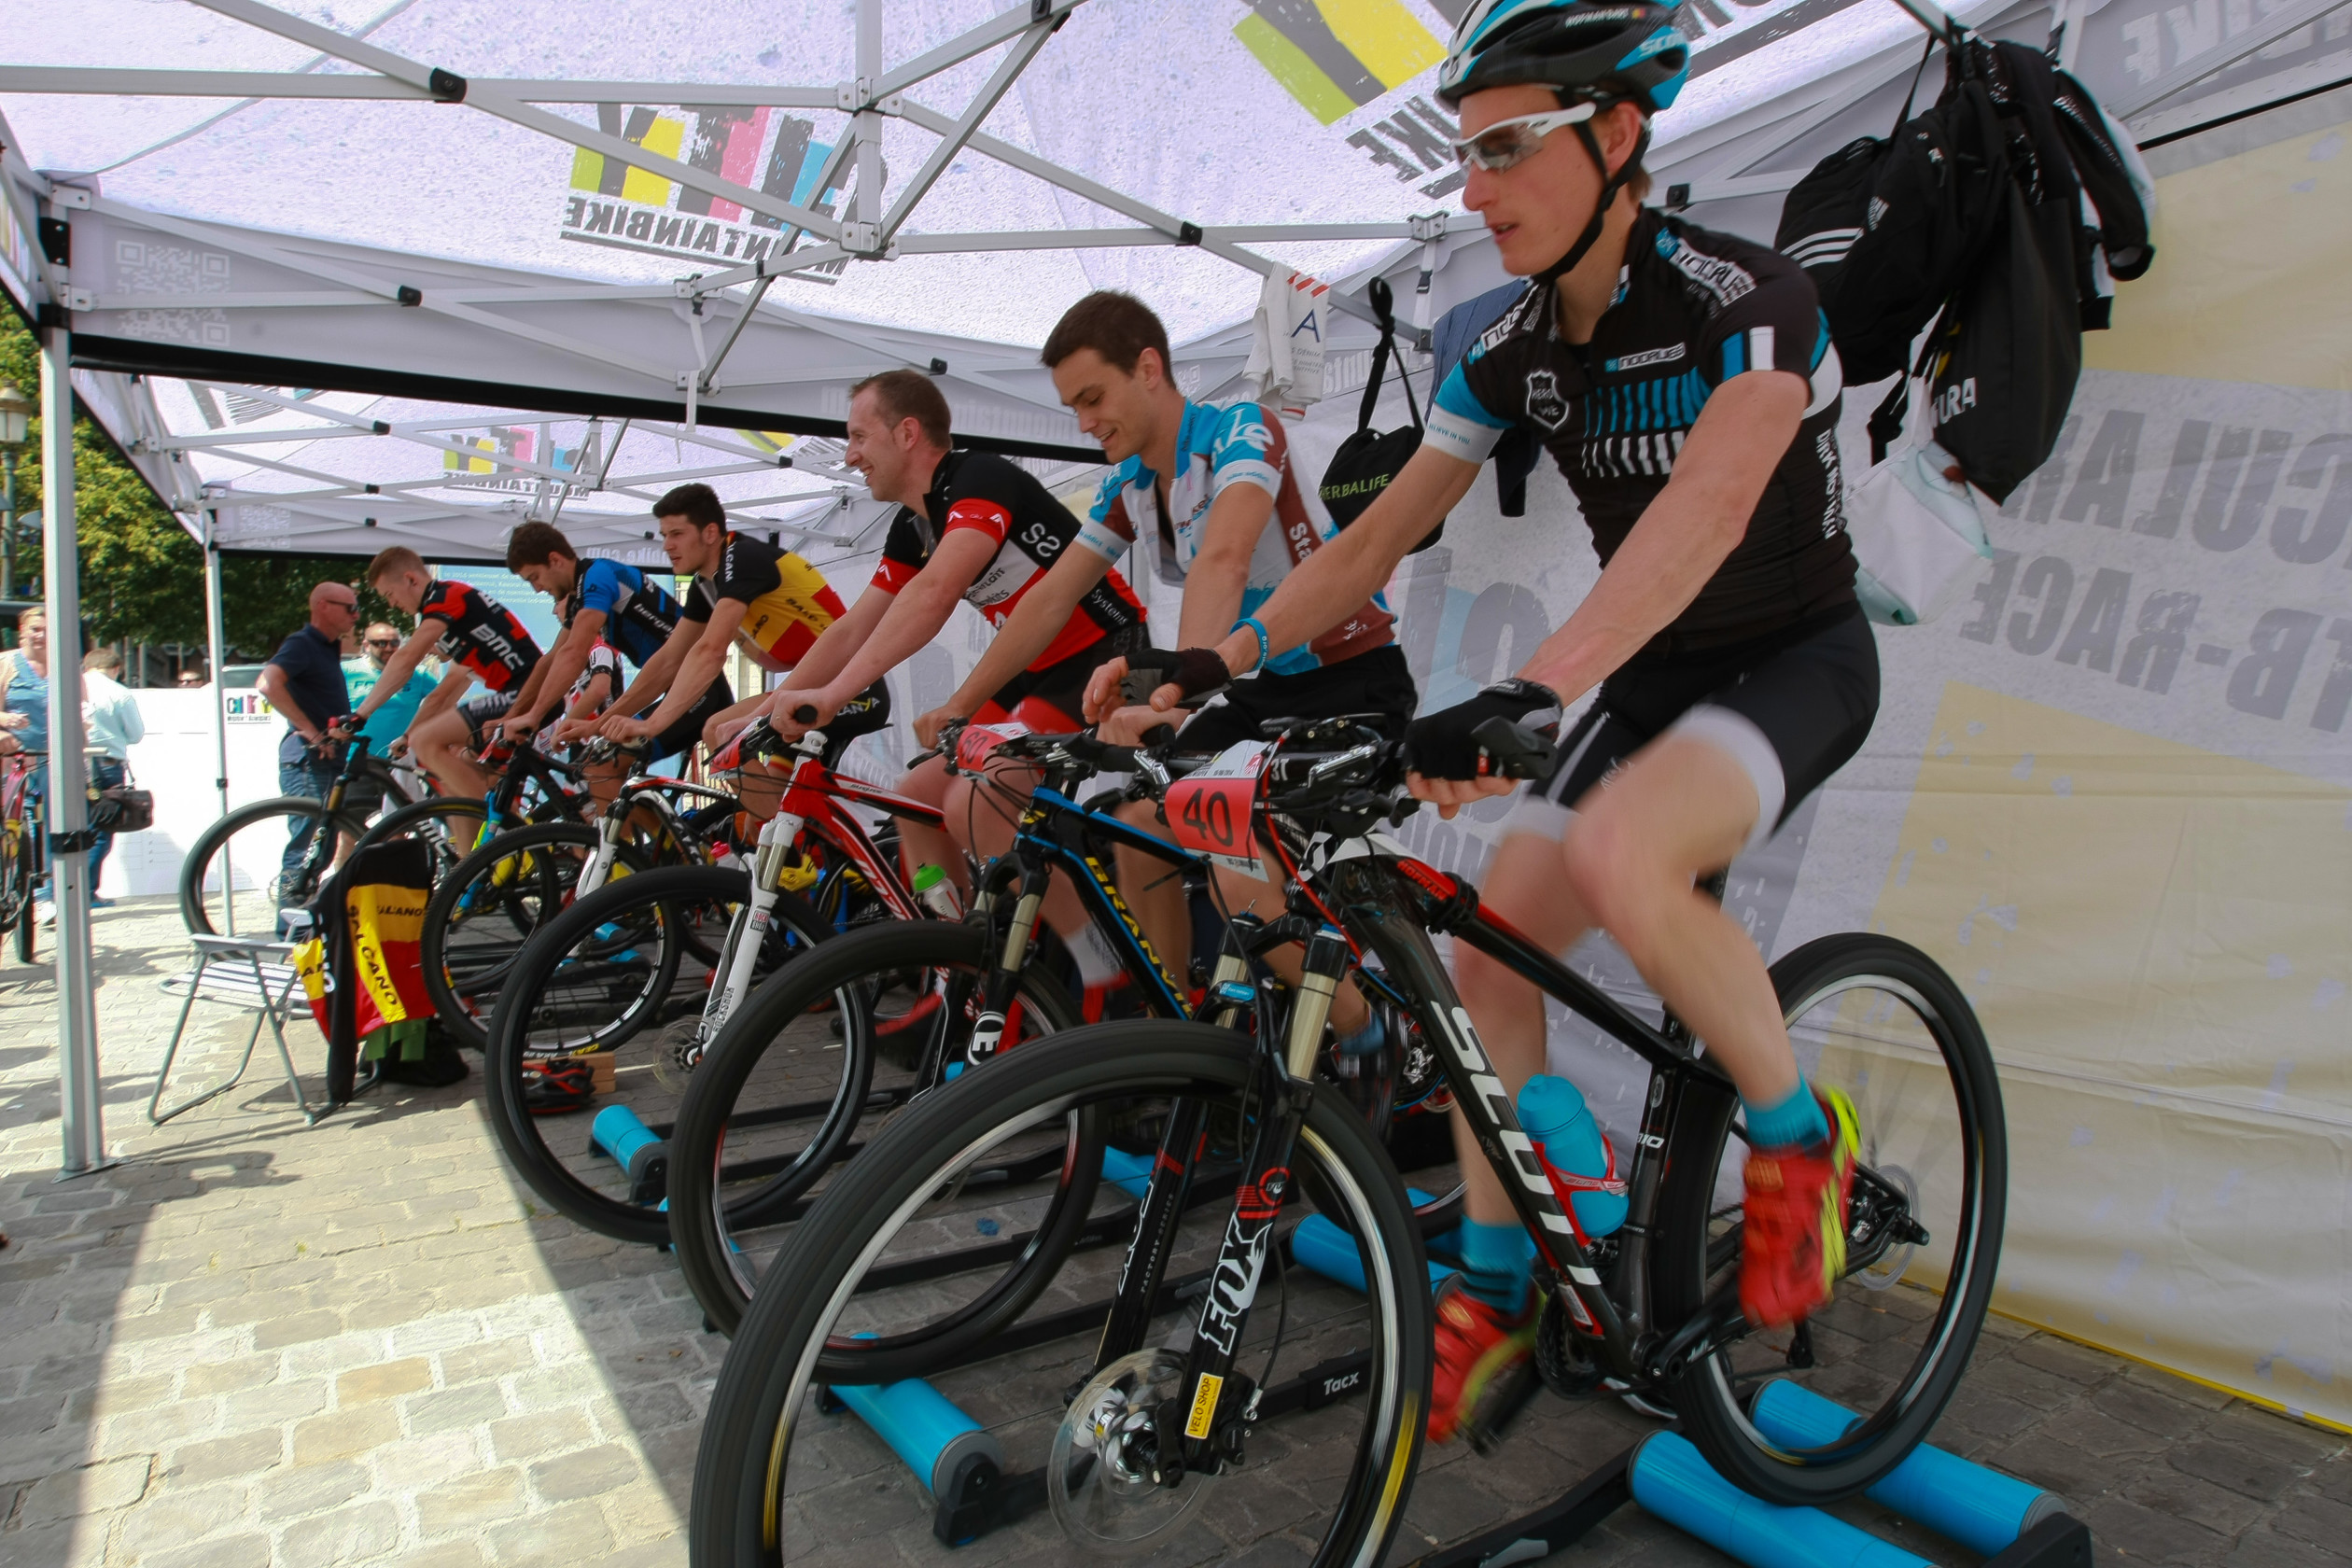 City MTB – UCI Eliminator 300 DPIAntwerpen 2014GLPE160614 8